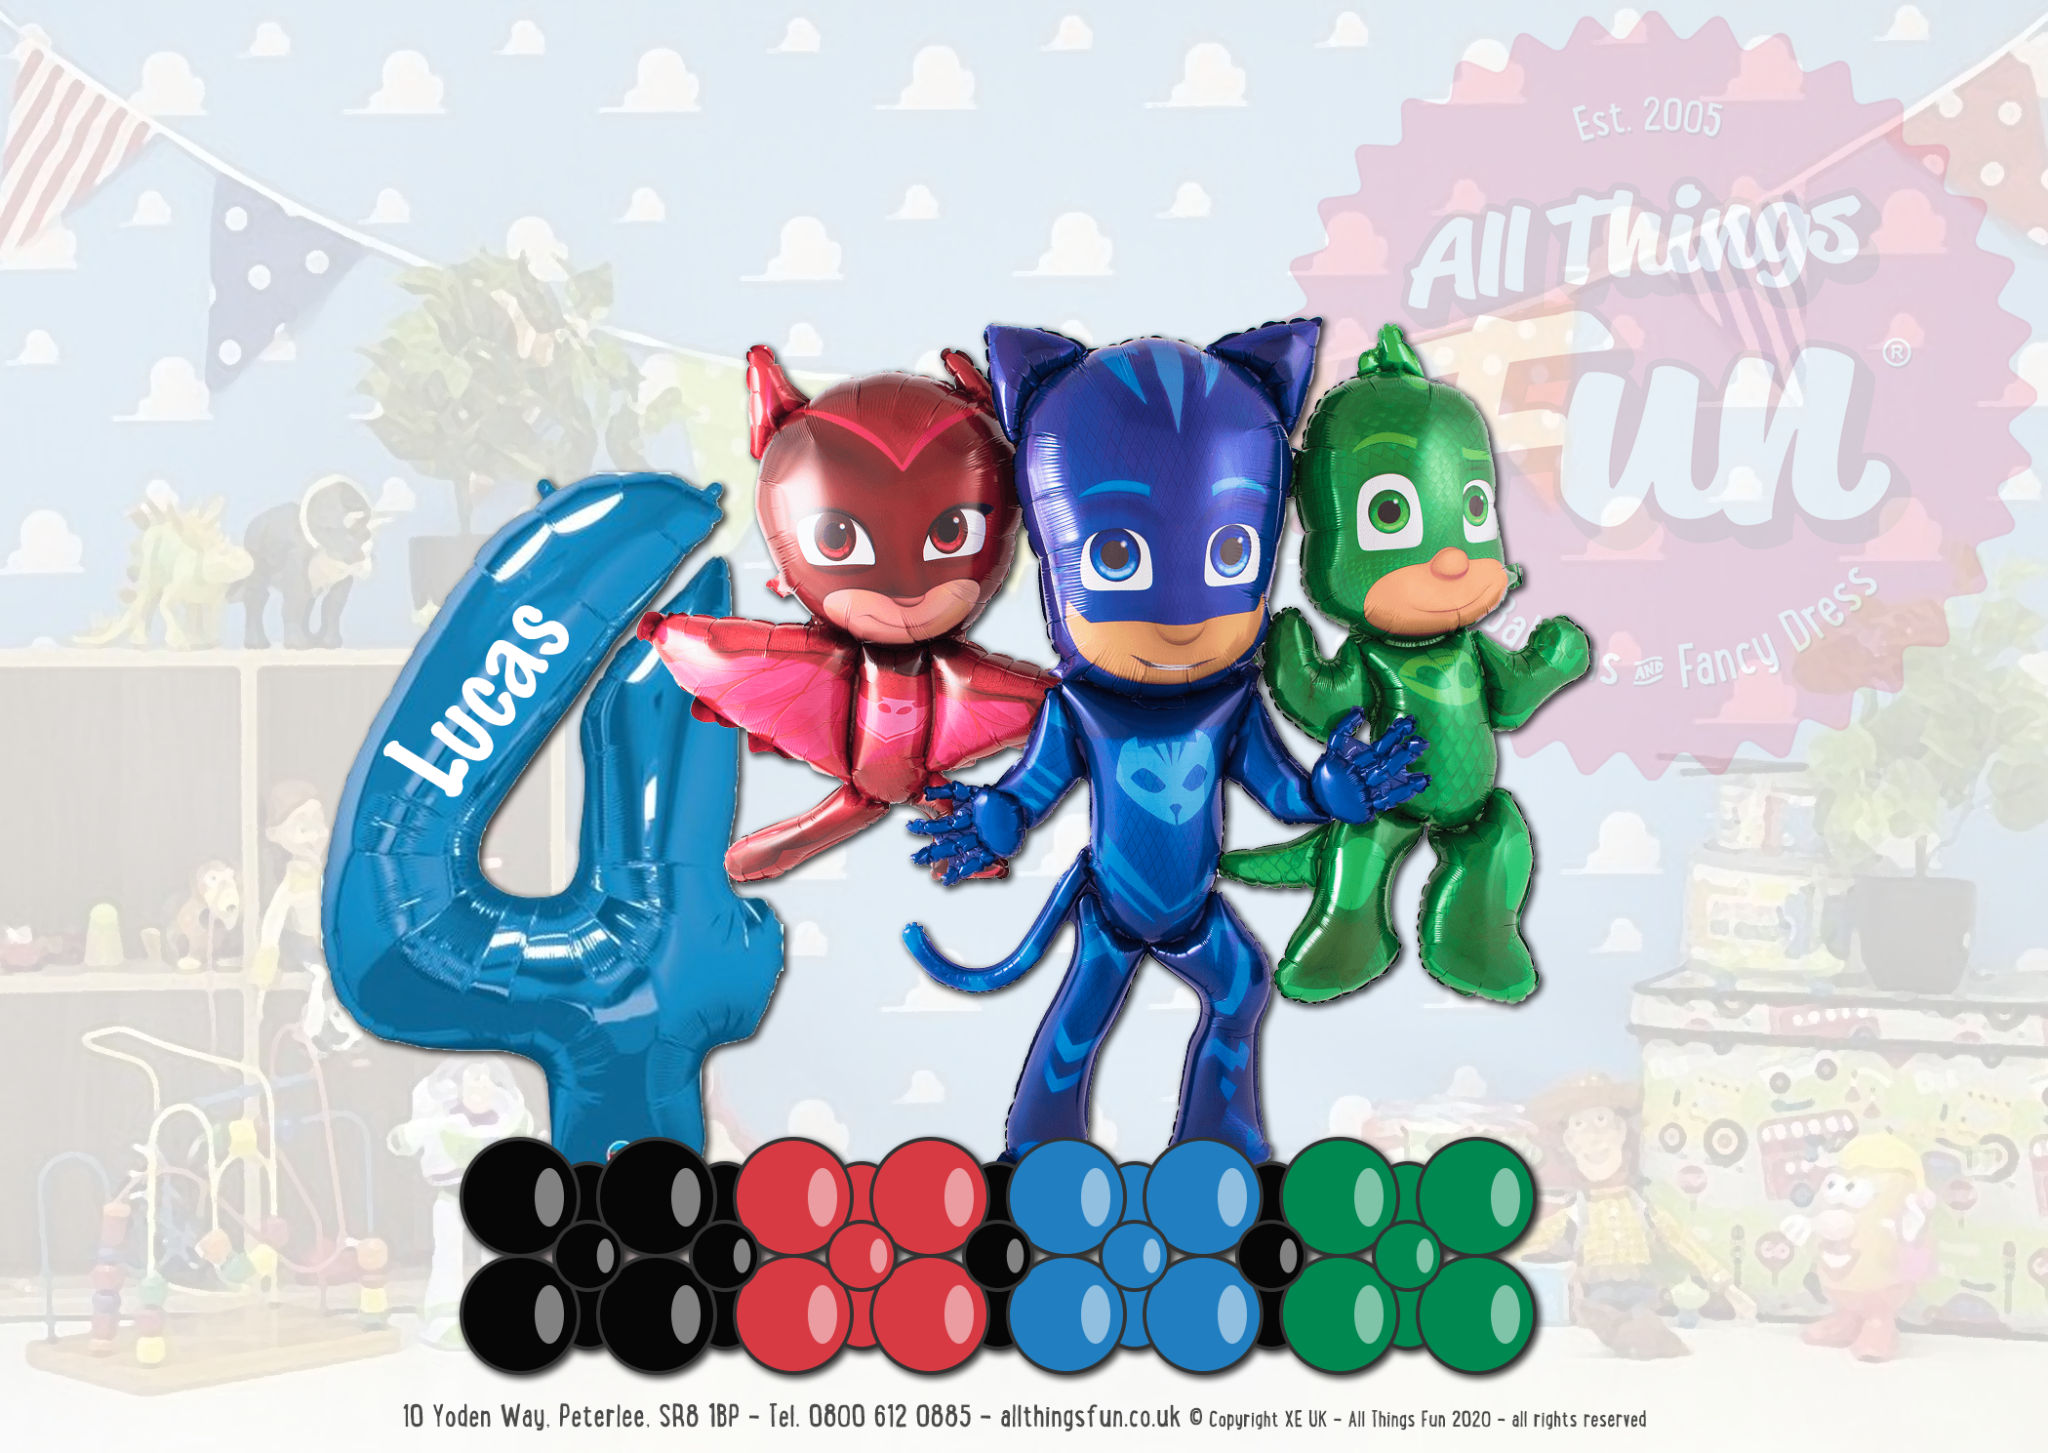 PJ Masks Awesome Balloon Design